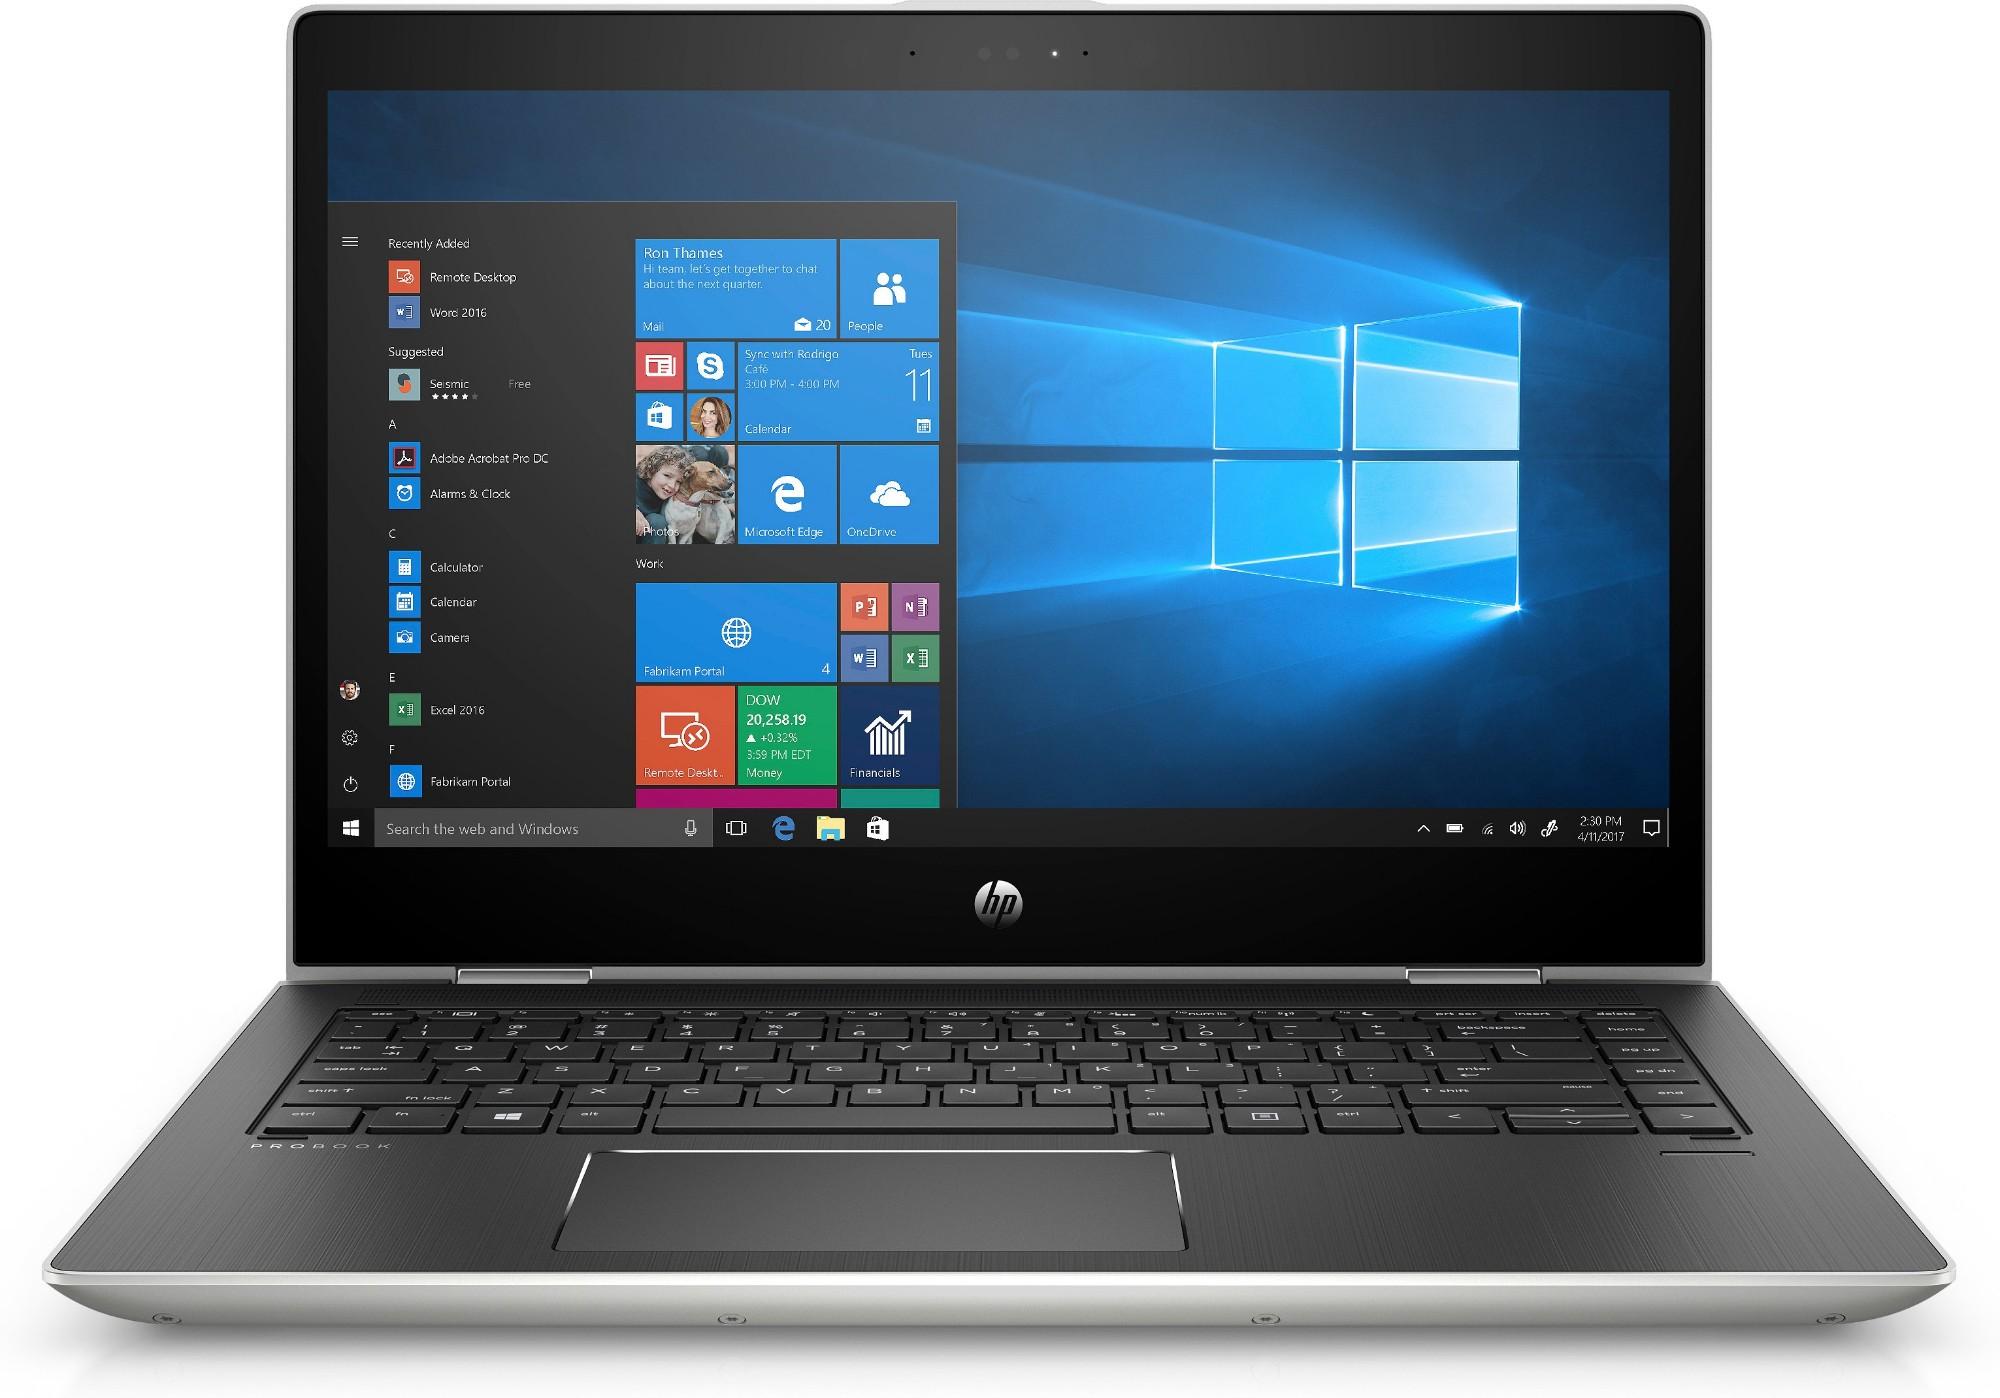 "HP ProBook x360 440 G1 Zilver Notebook 35,6 cm (14"") 1920 x 1080 Pixels Touchscreen Intel® 8ste generatie Core™ i3 4 GB DDR4-SDRAM 512 GB SSD Windows 10 Home"